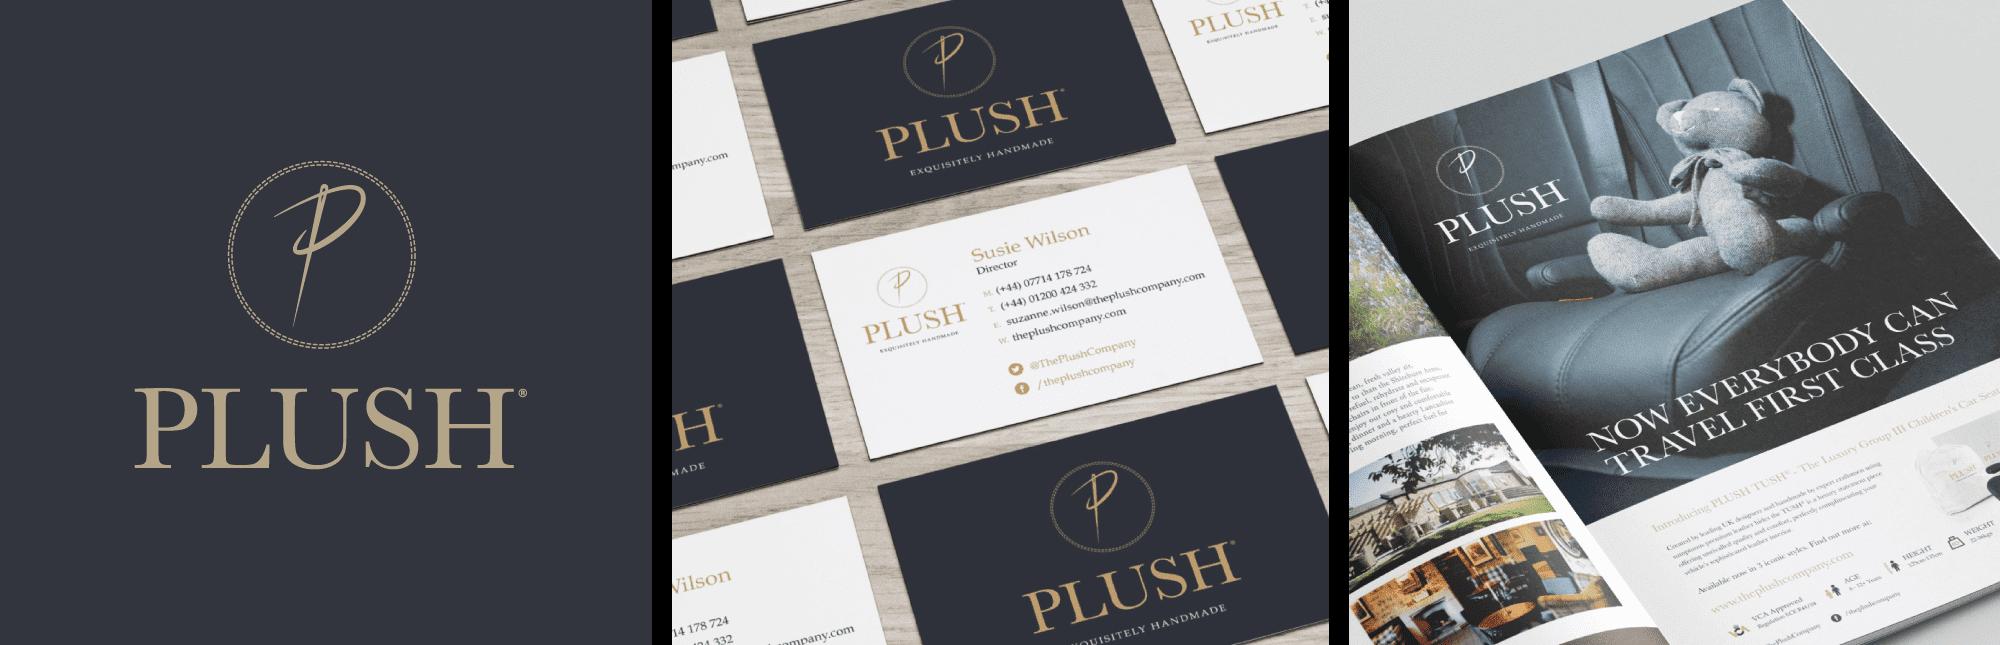 Plush - Print